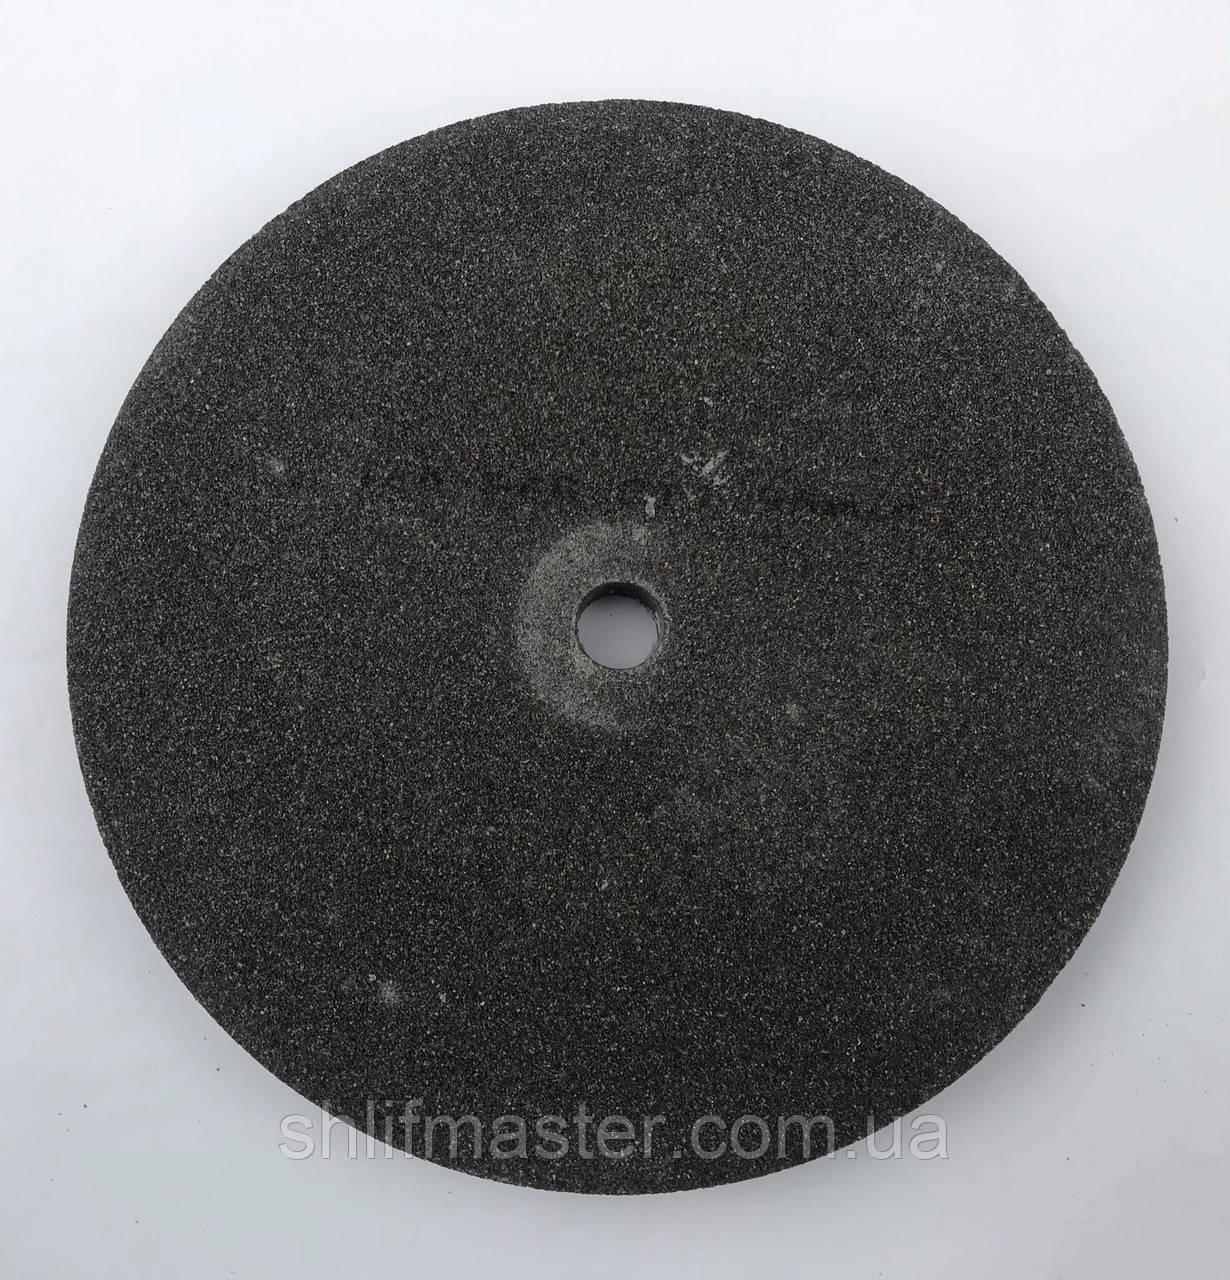 Круг шлифовальный электрокорунд серый керамика 14А ПП 125х16х12,7 16-40 СТ/F80-F40 O